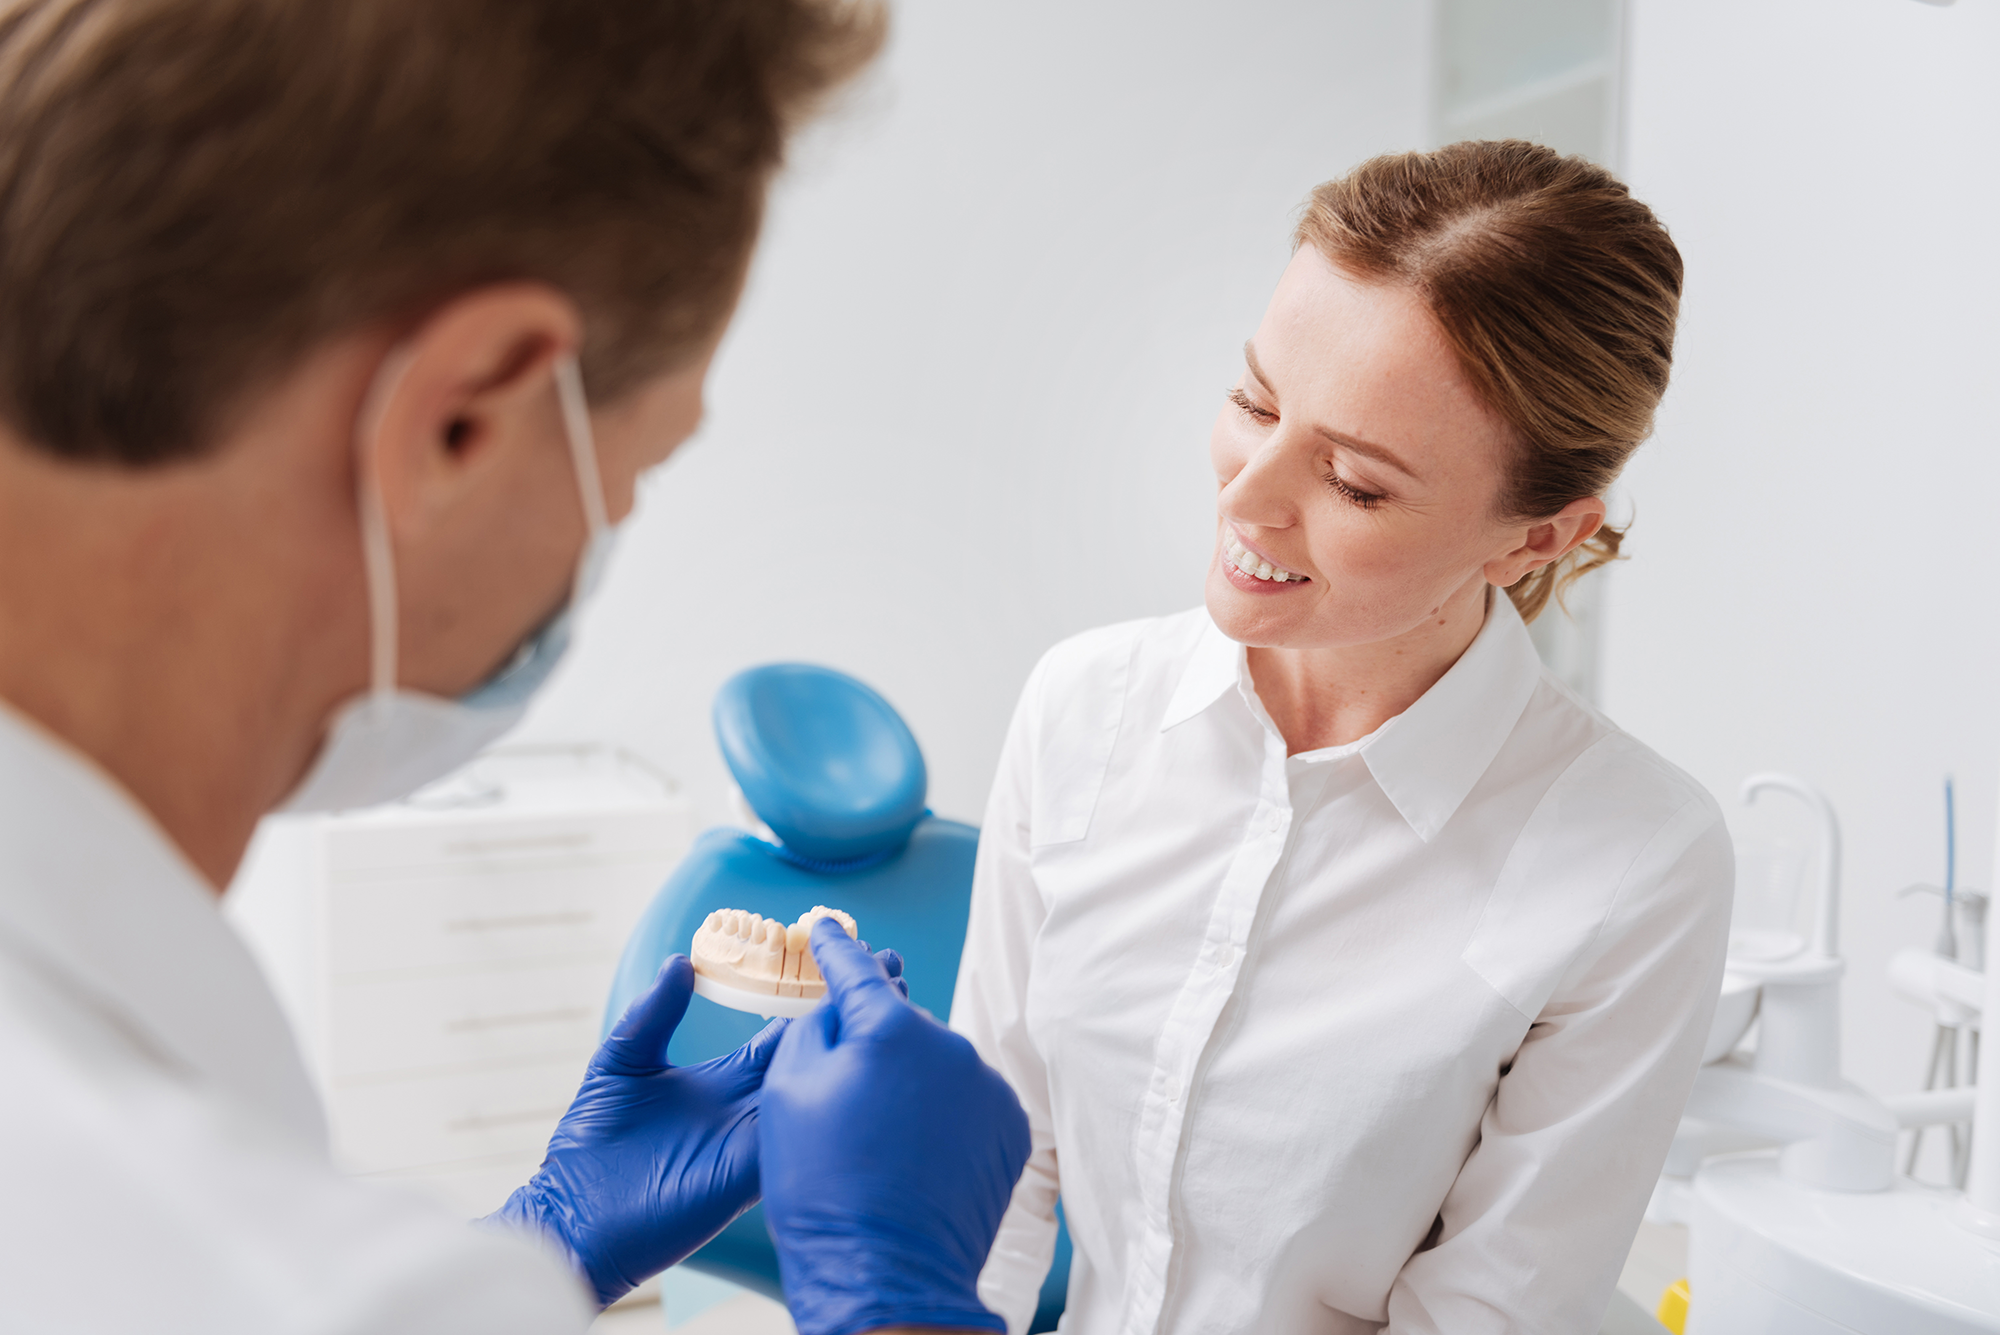 Effective Education for Dental Implant Patients